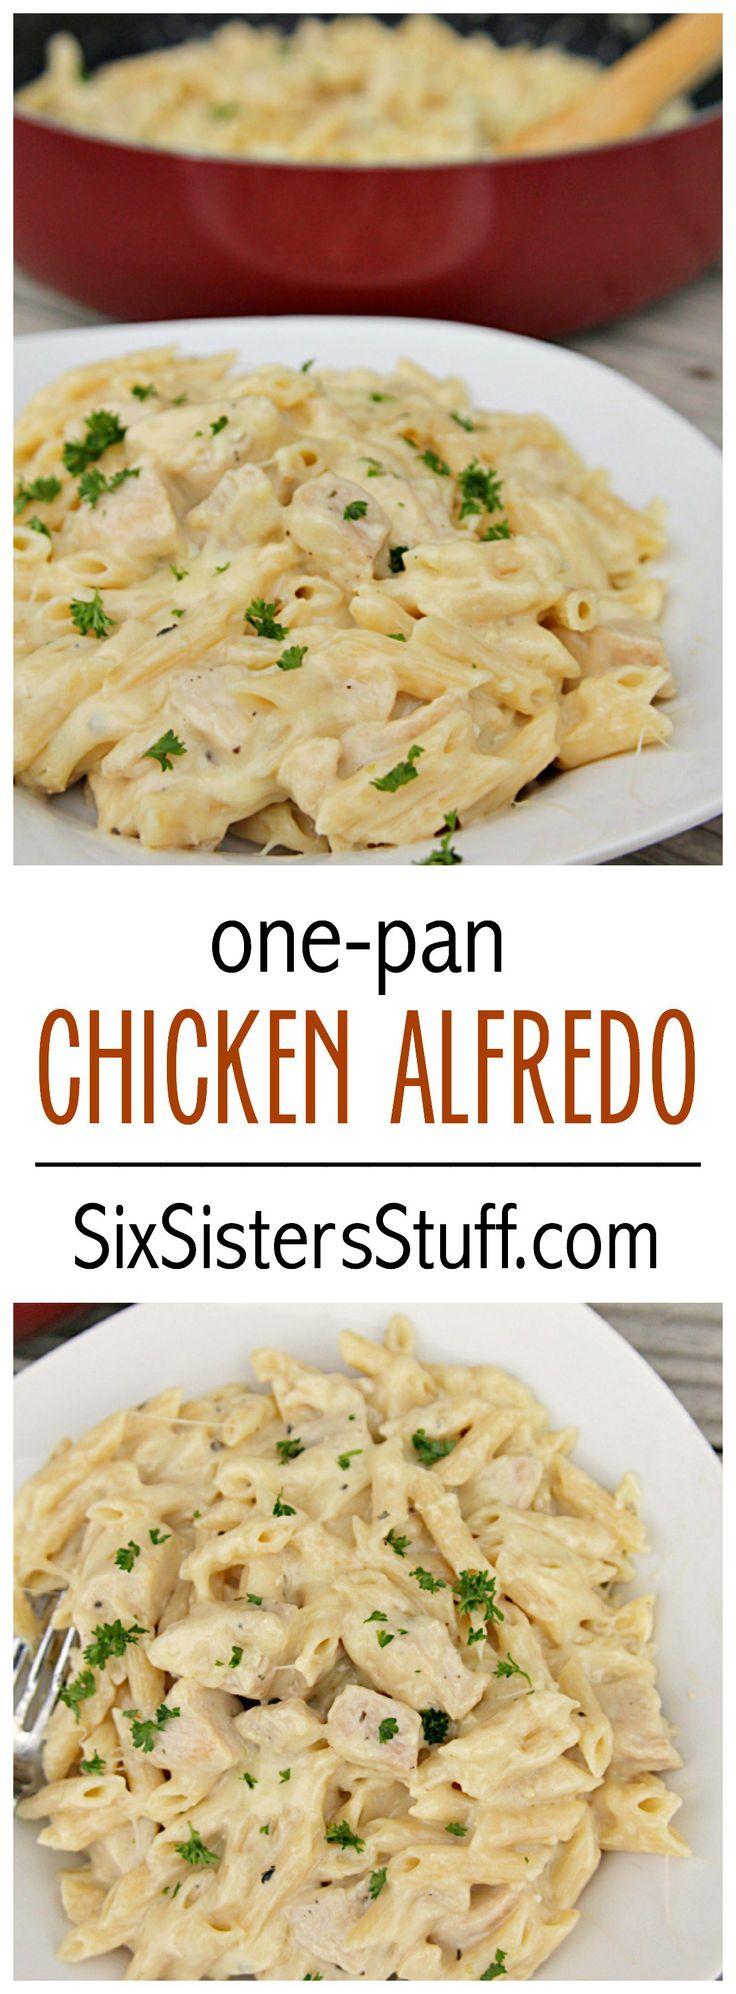 One-Pan Chicken Alfredo on SixSistersStuff.com